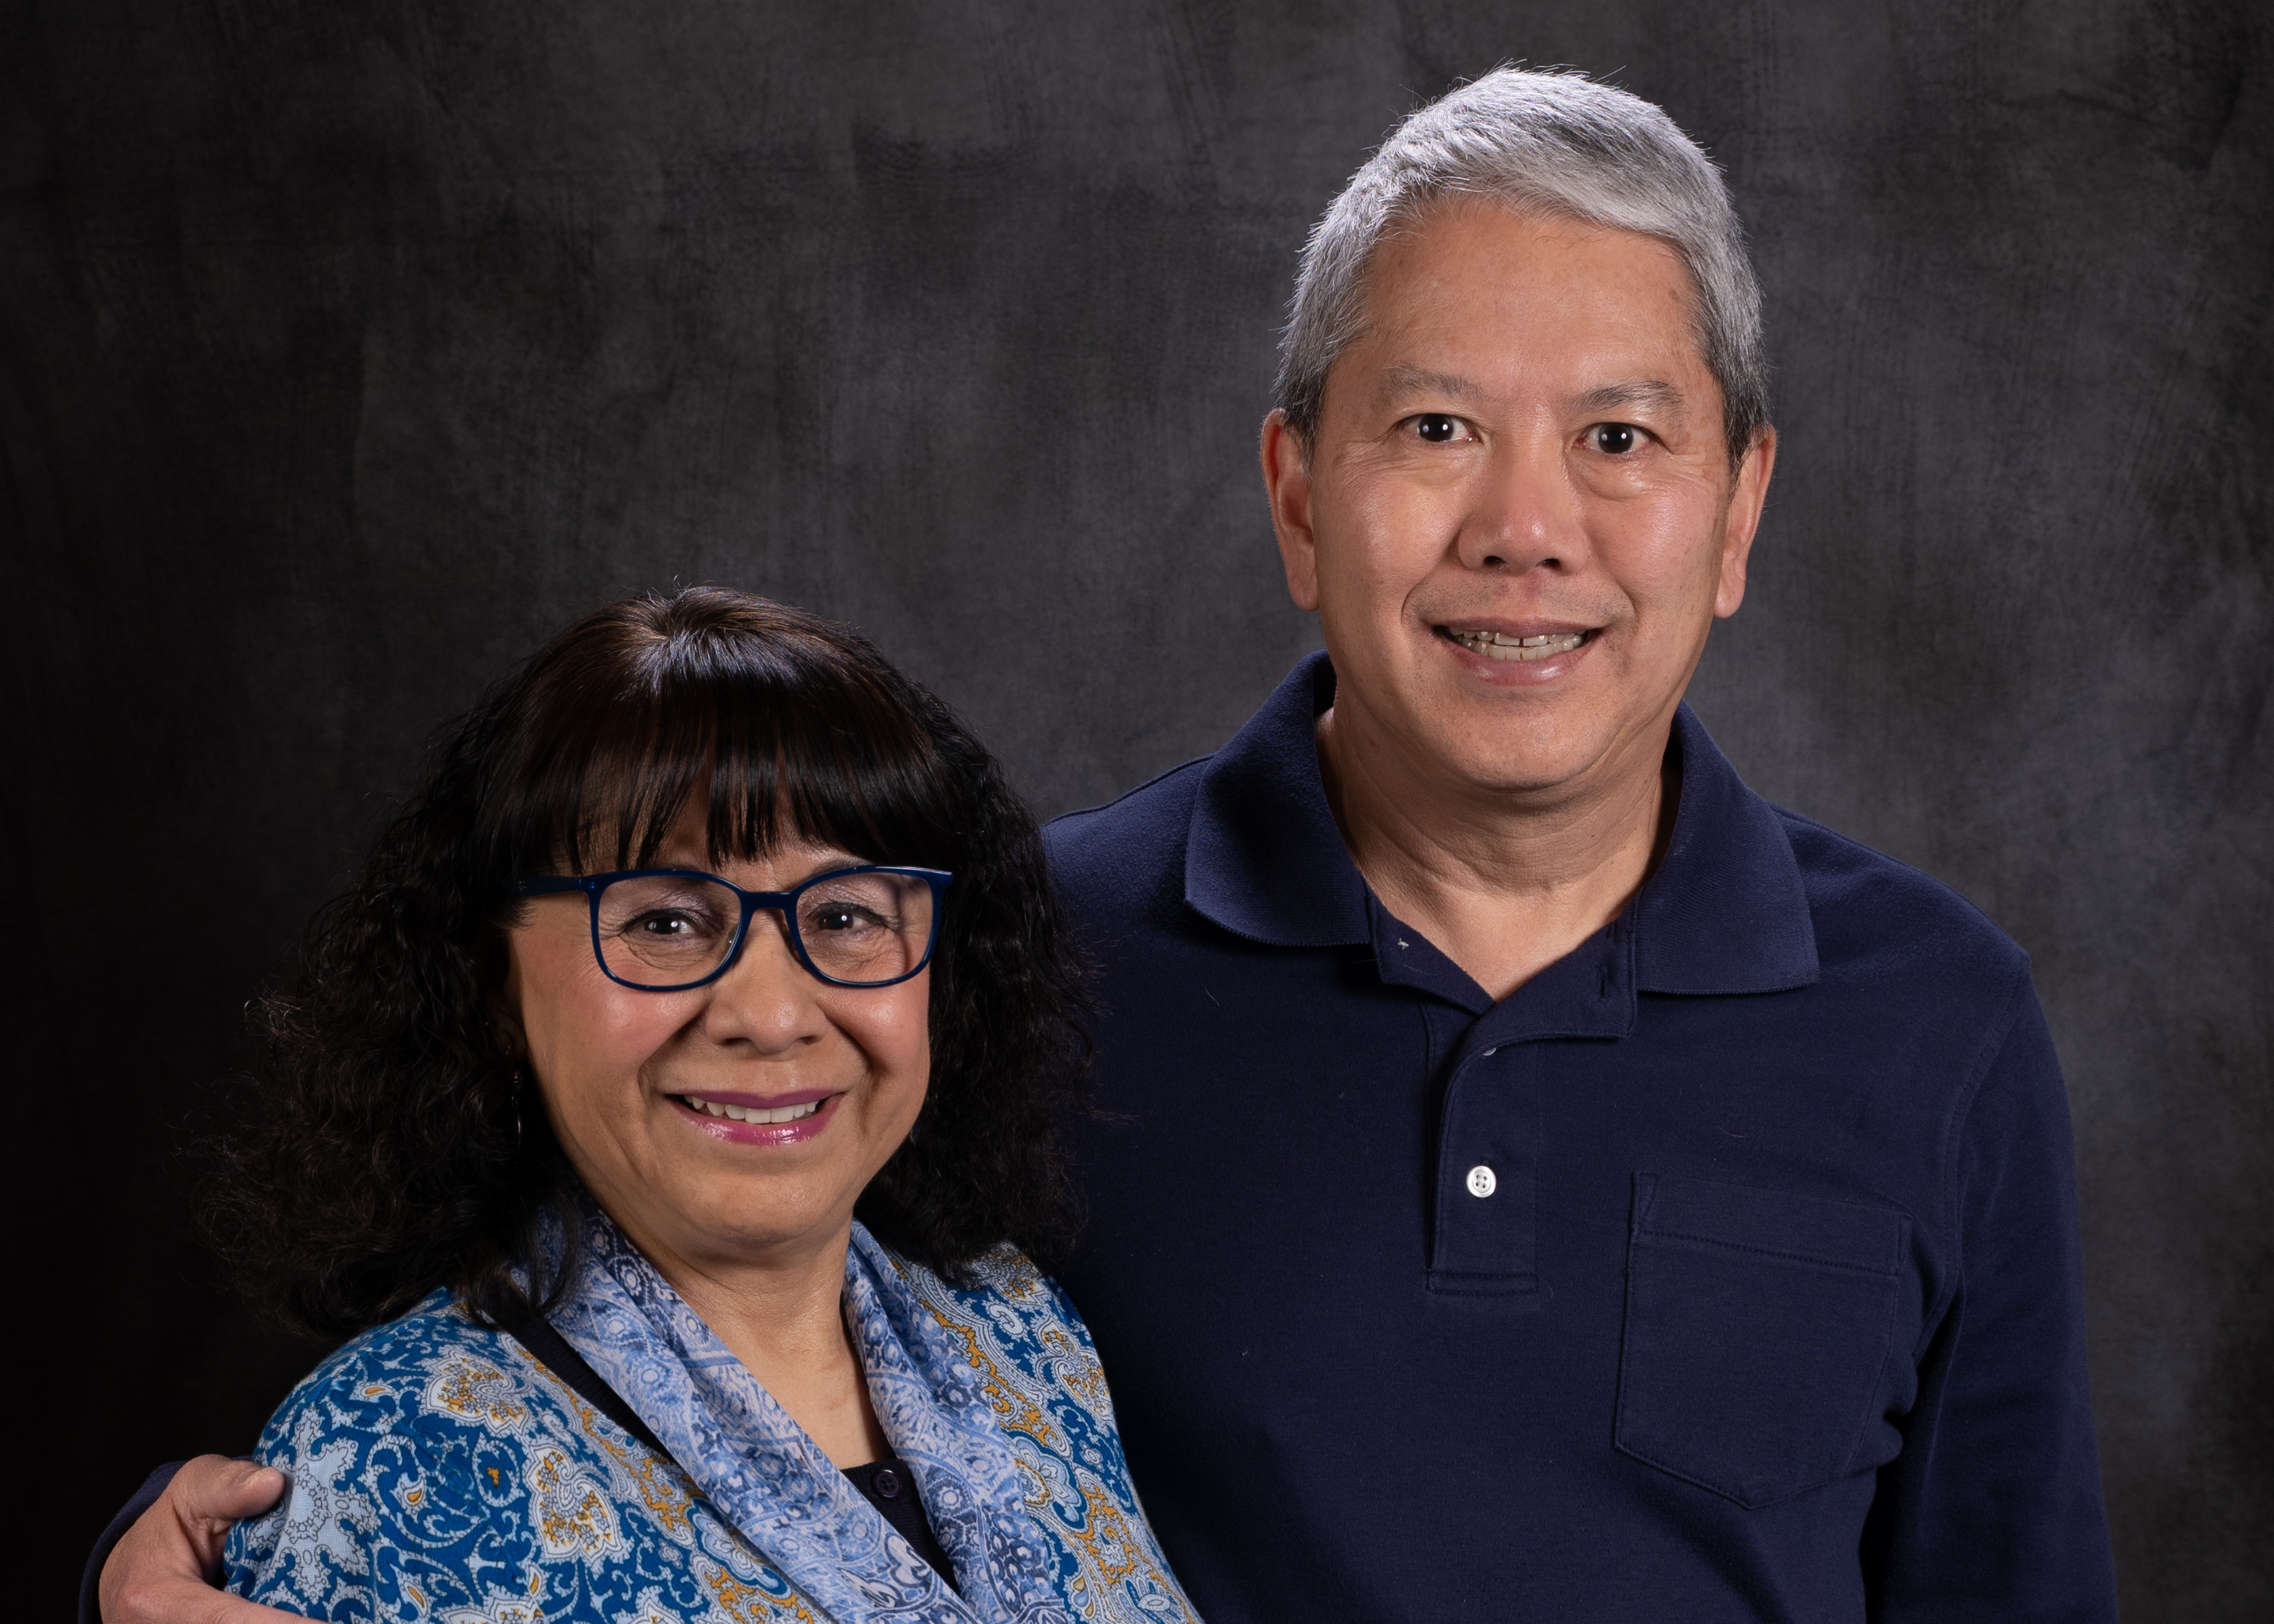 Mike and Maria Kwan